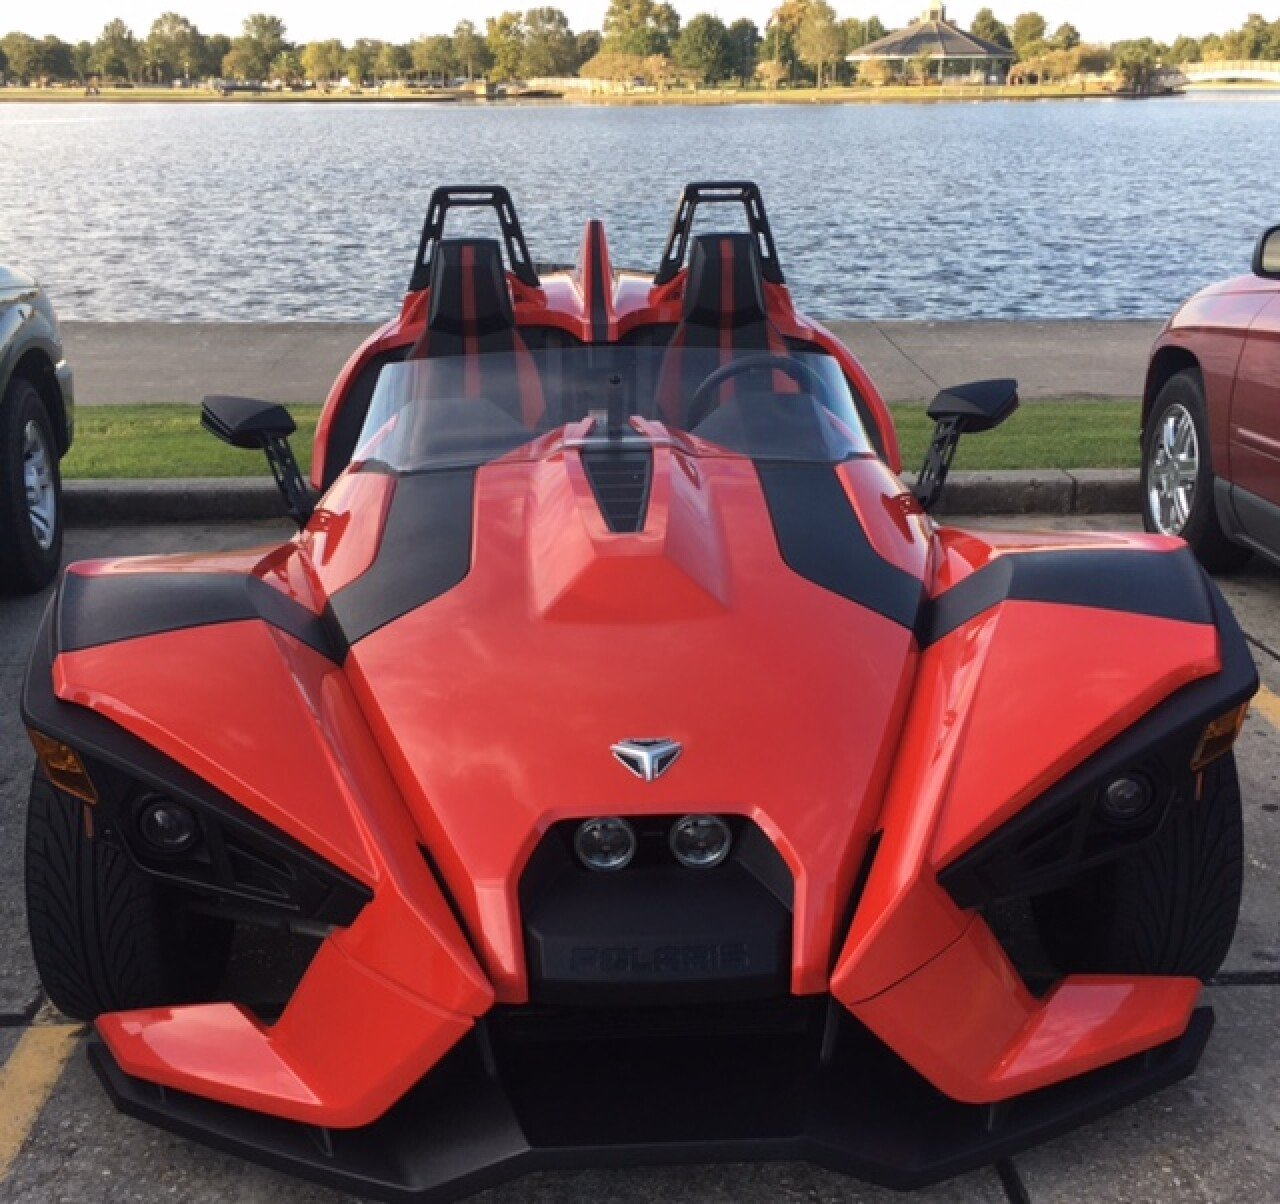 Polaris Slingshot For Sale Craigslist New Cars Upcoming 2019 2020